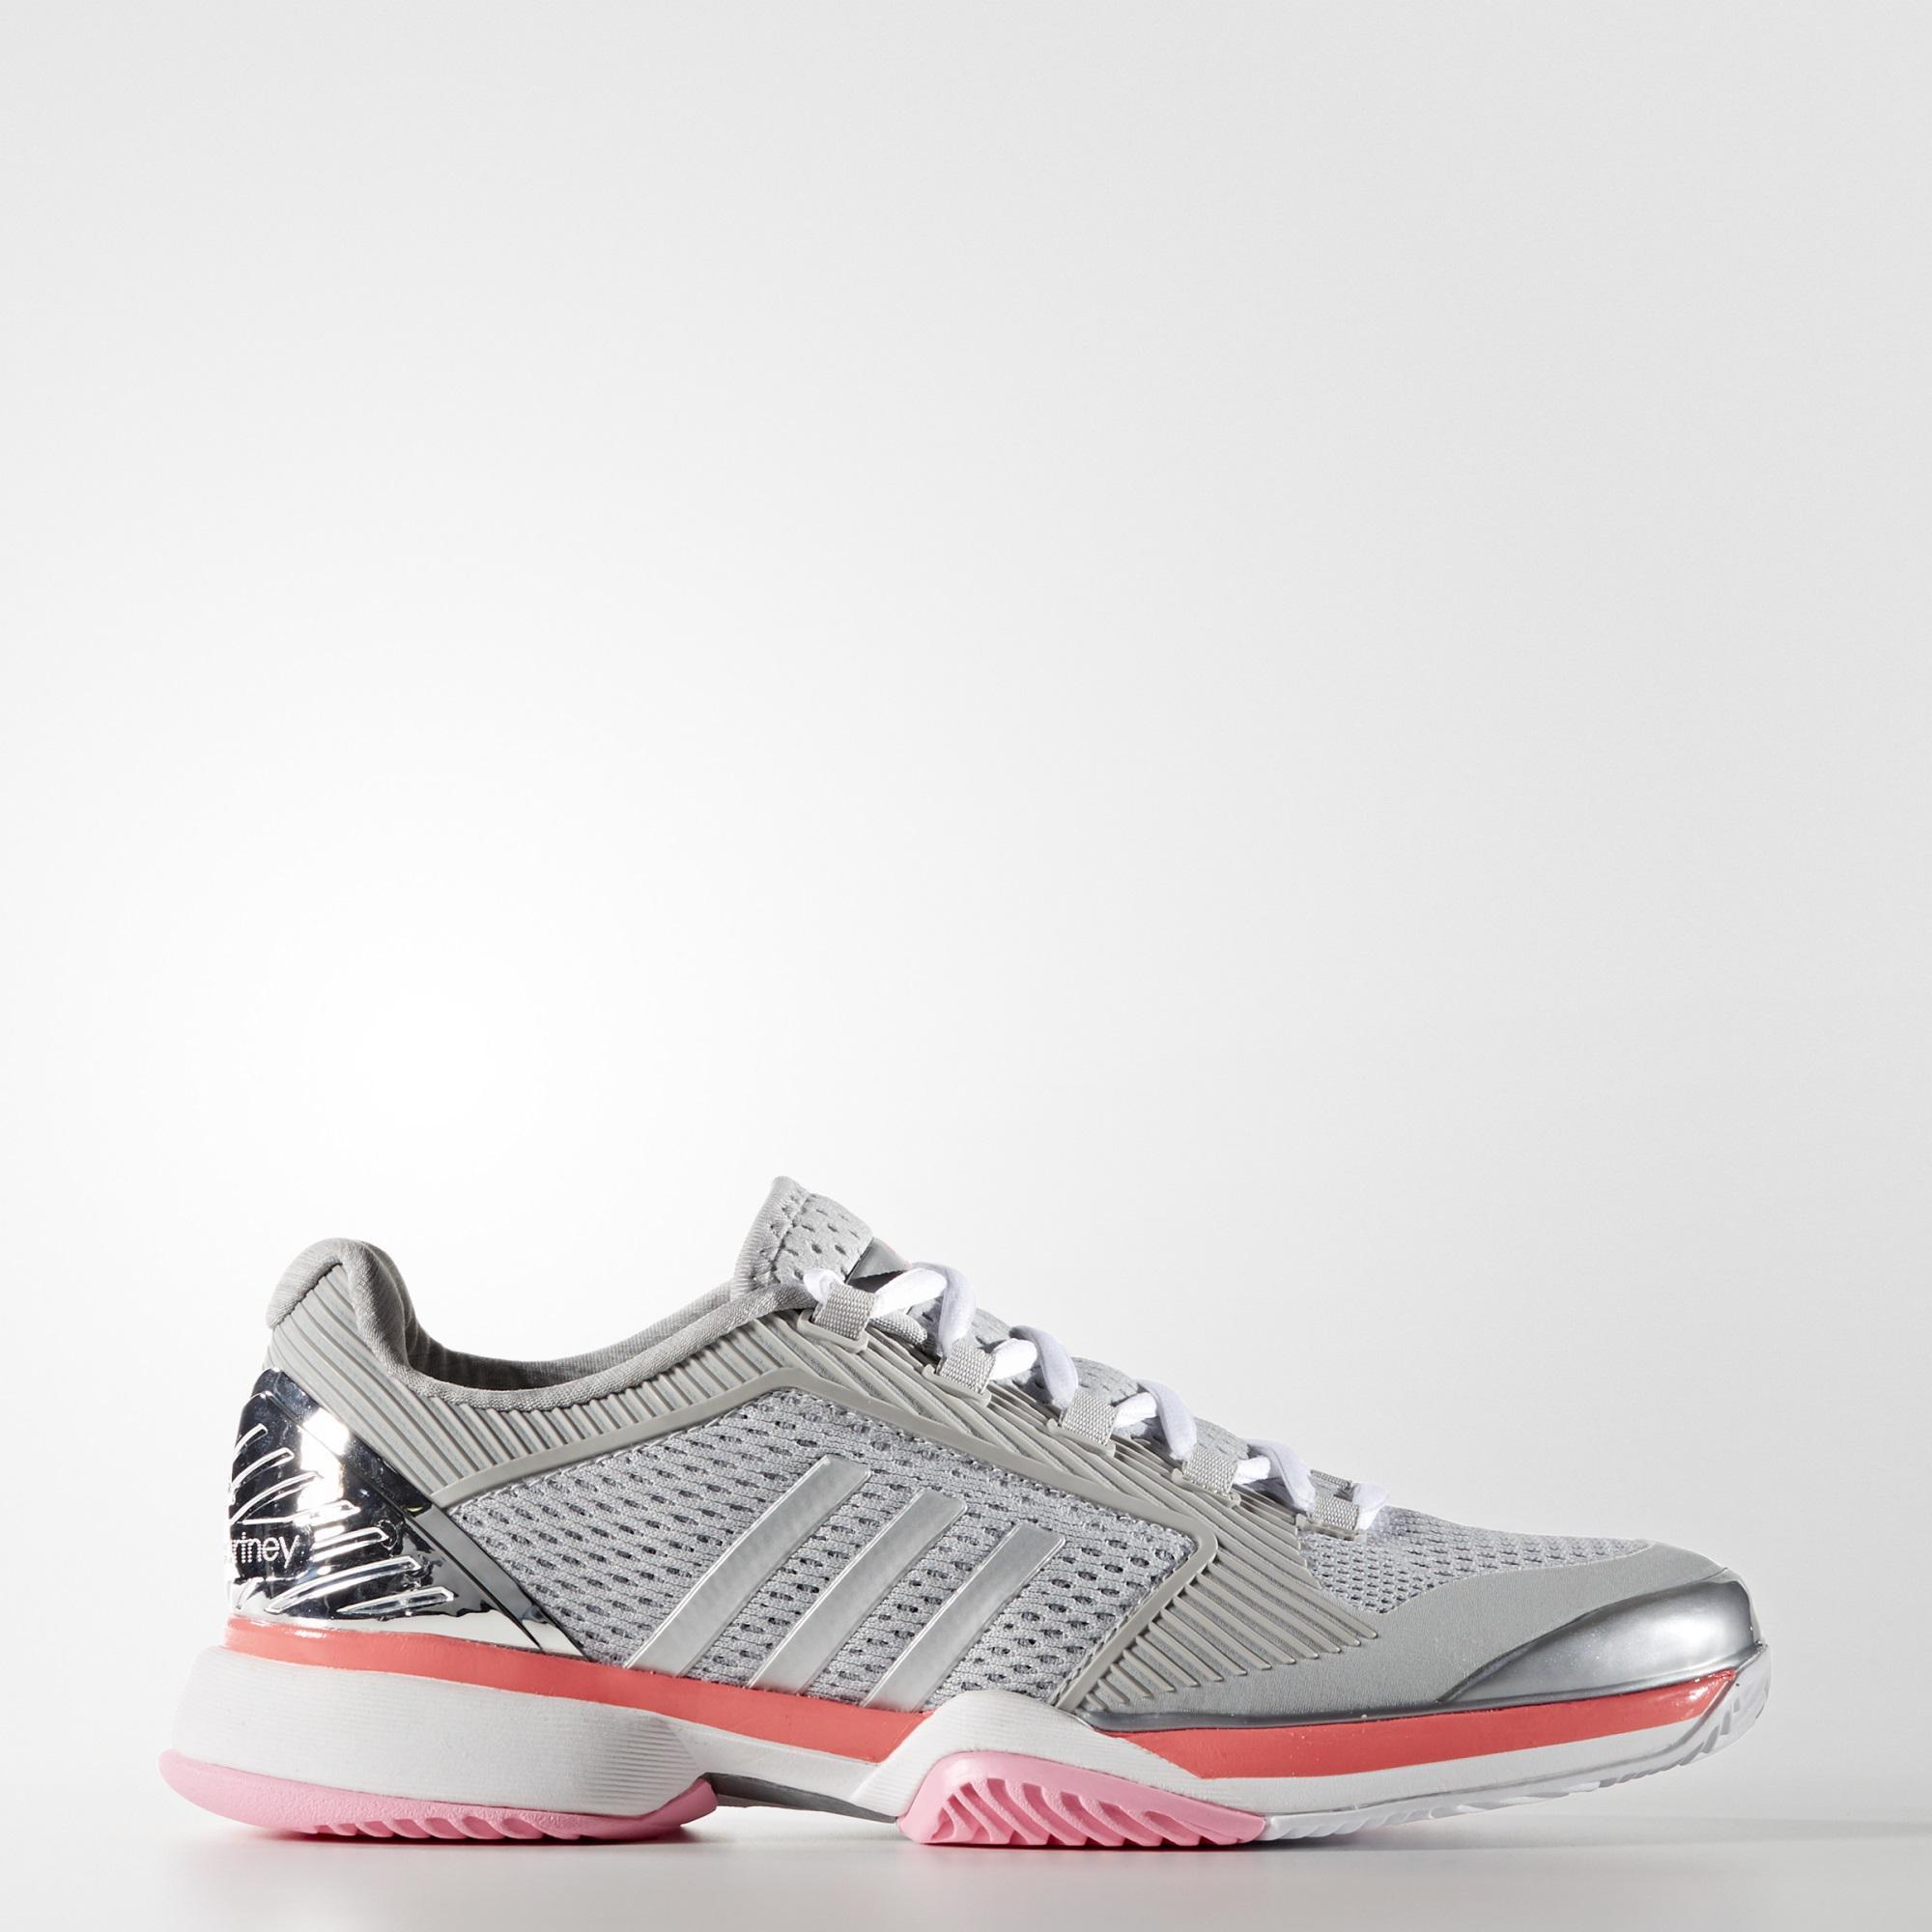 online store 684af e3a08 Adidas Womens SMC Barricade 2016 Tennis Shoes - Silver - Ten